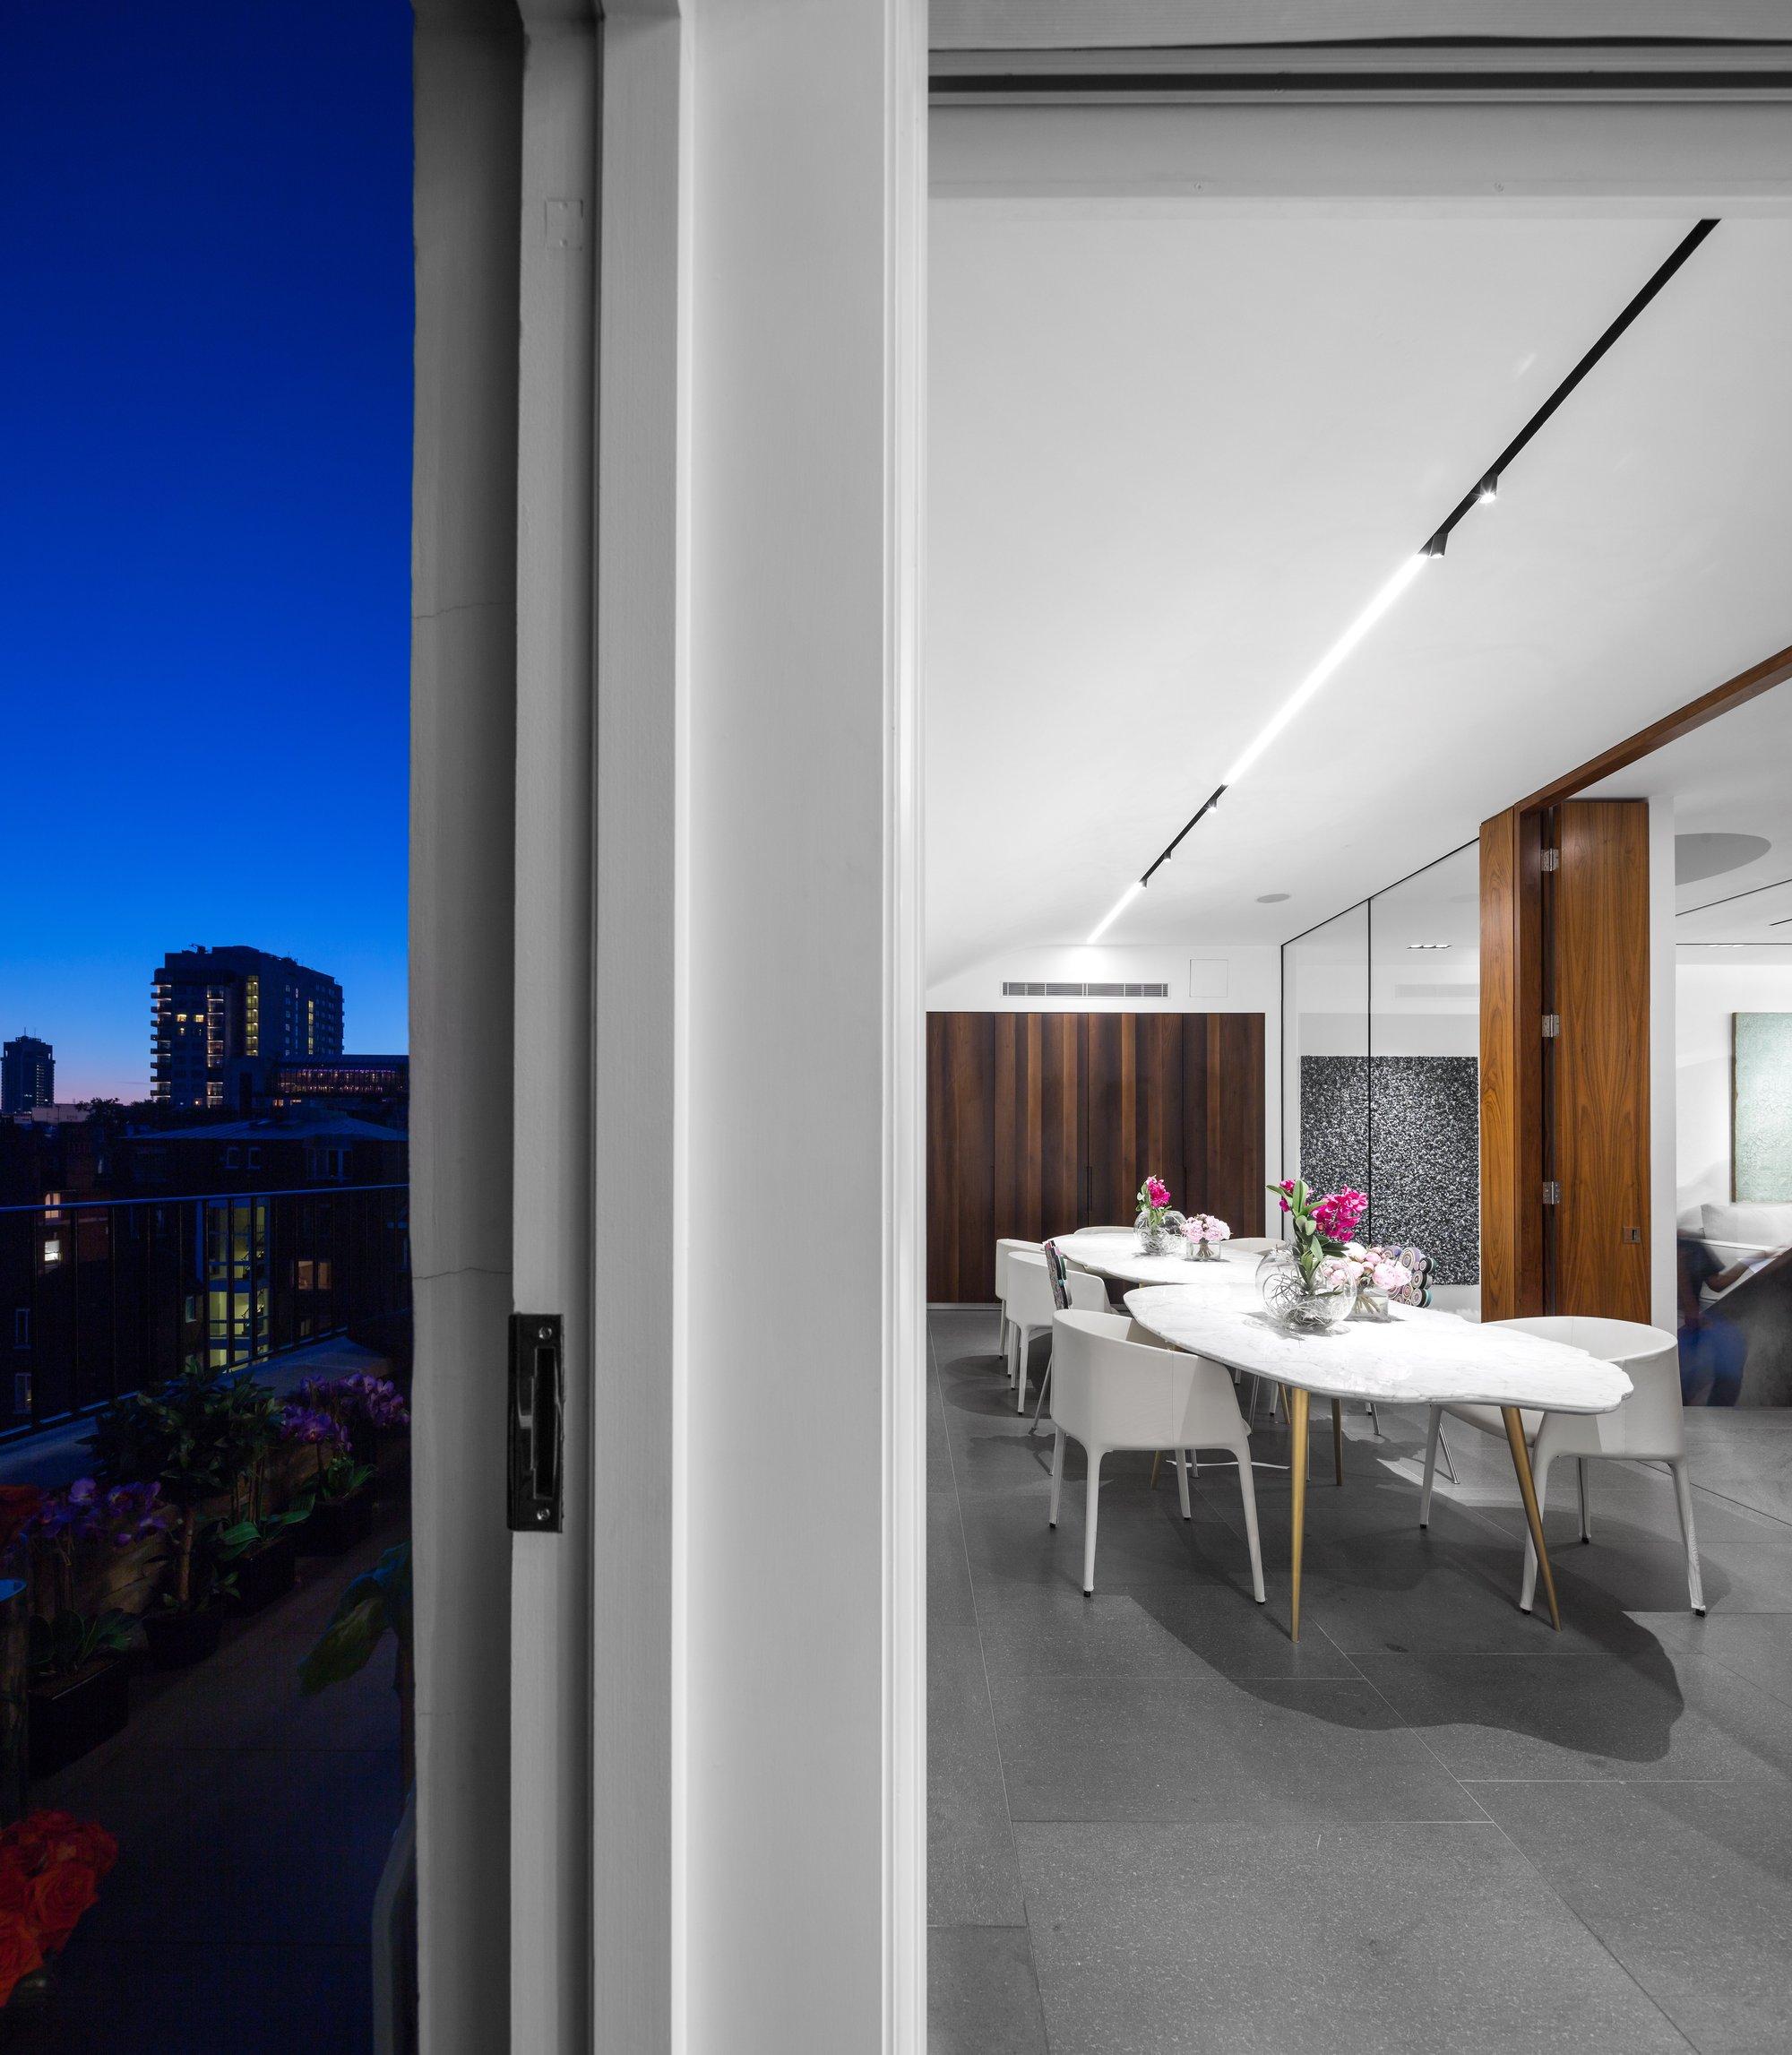 Galeria de london ii fernanda marques arquitetos - Maison contemporaine exotique fernanda marques ...